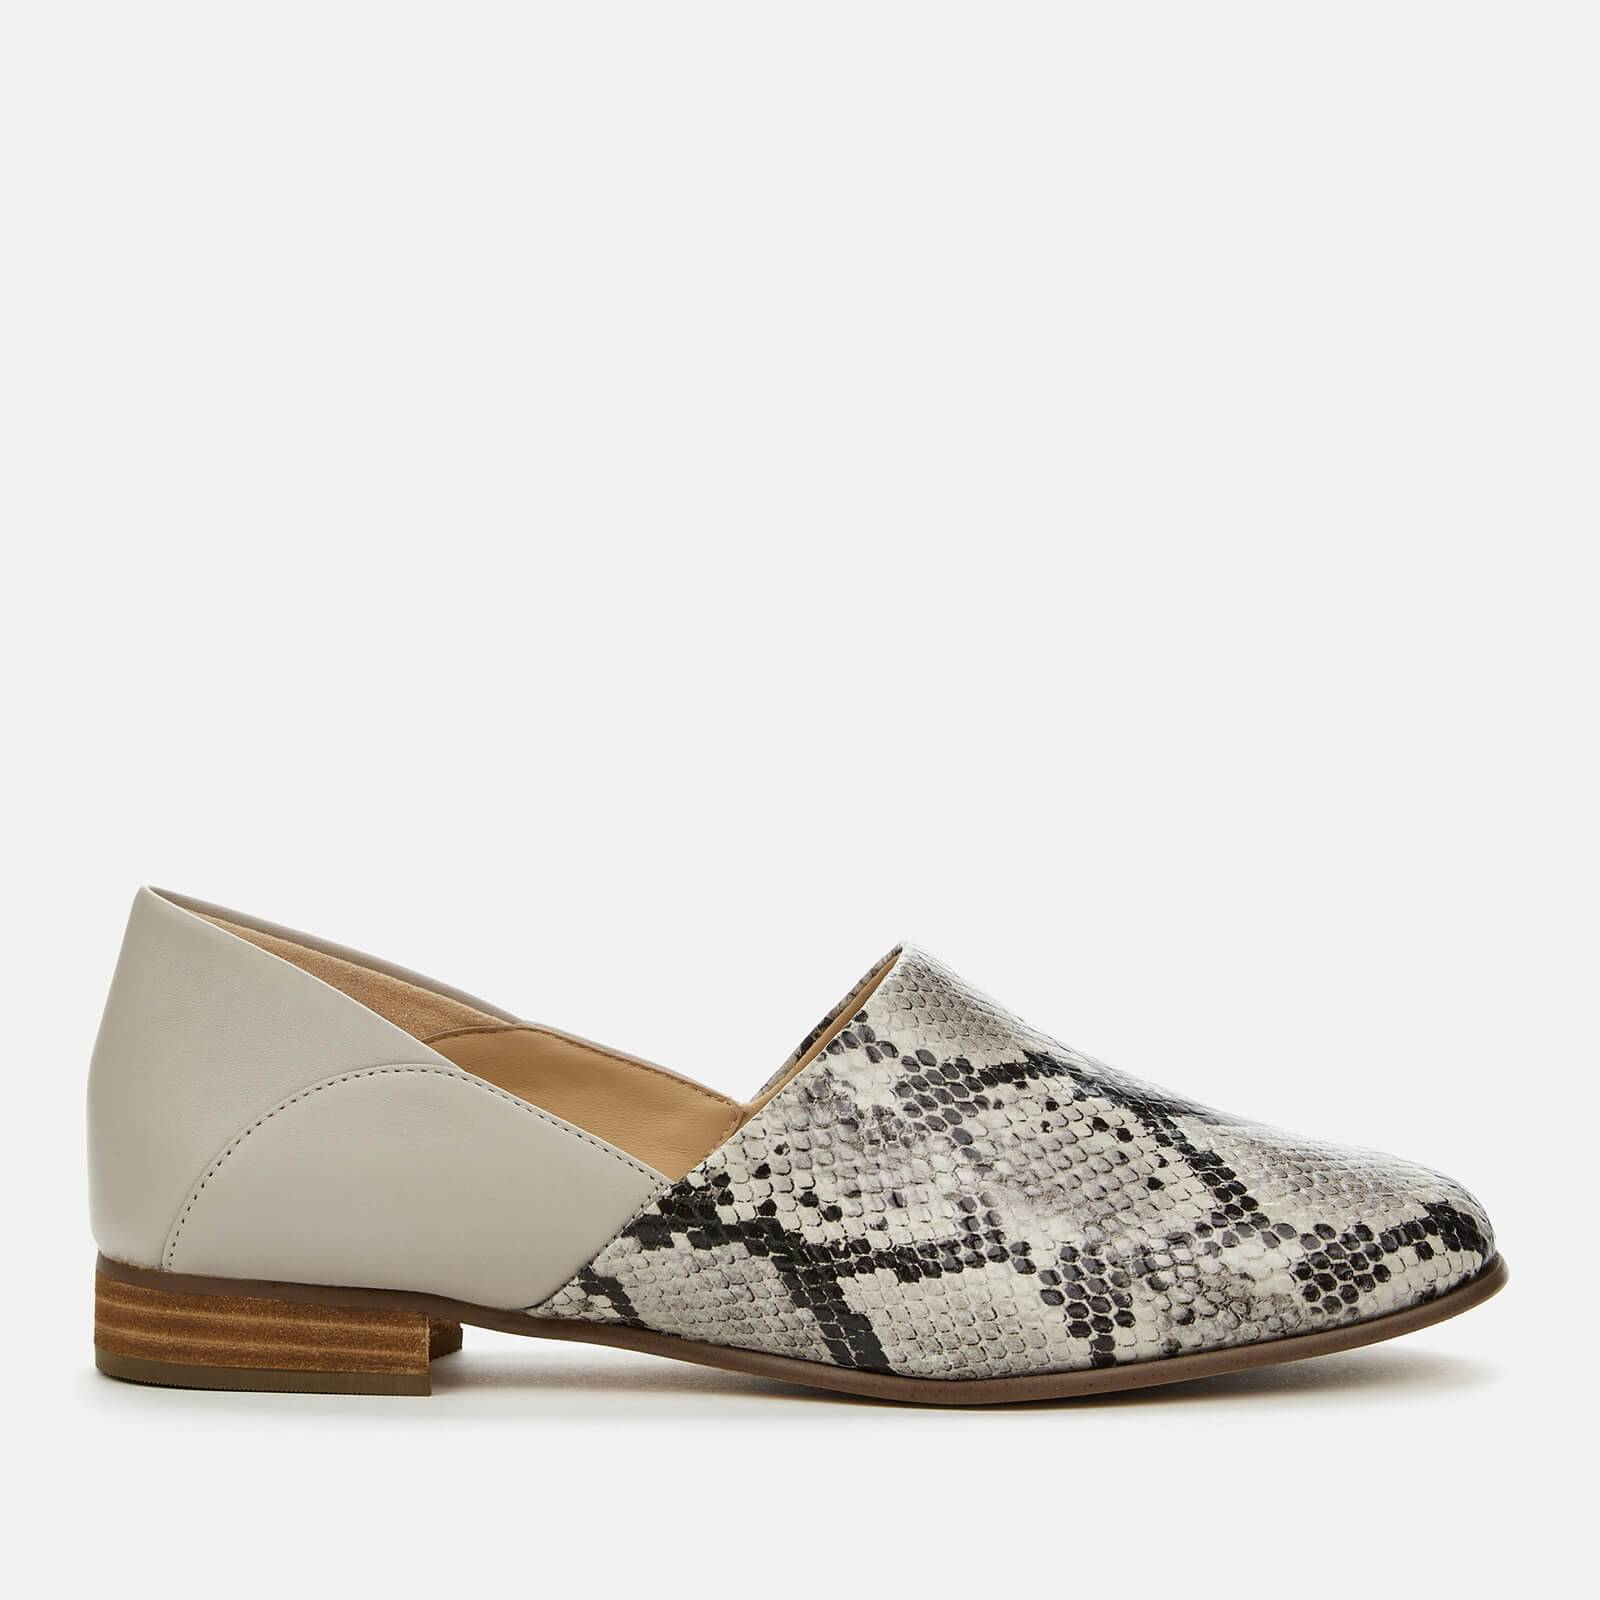 Clarks Women's Pure Tone Flat Shoes - Grey Snake - UK 4